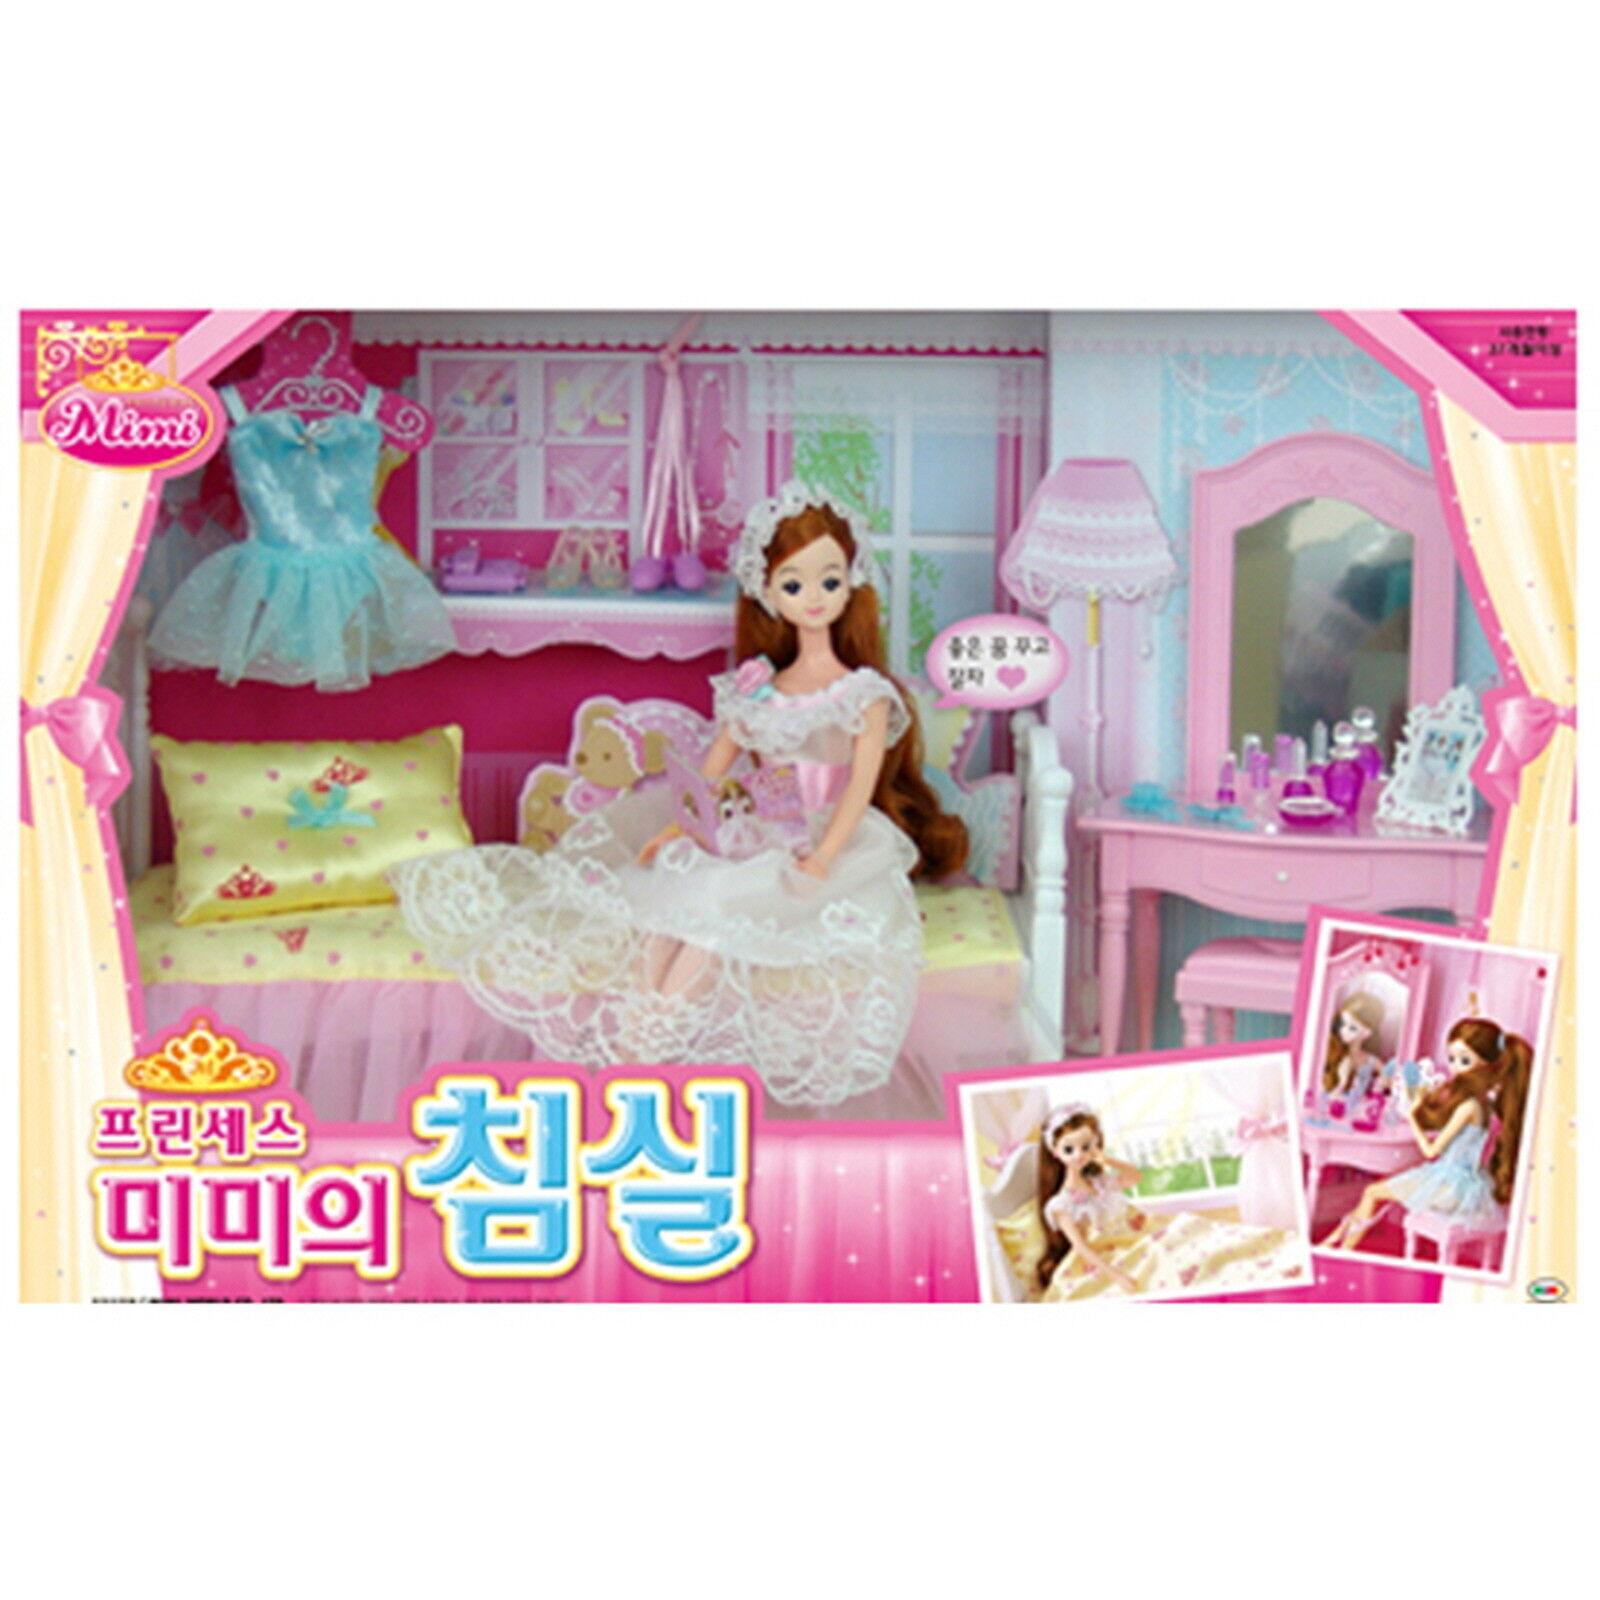 Prinsessan MIMIMI Bedroom Barbie Doll Role Spela Korea Character Fairy Fairy flickor present